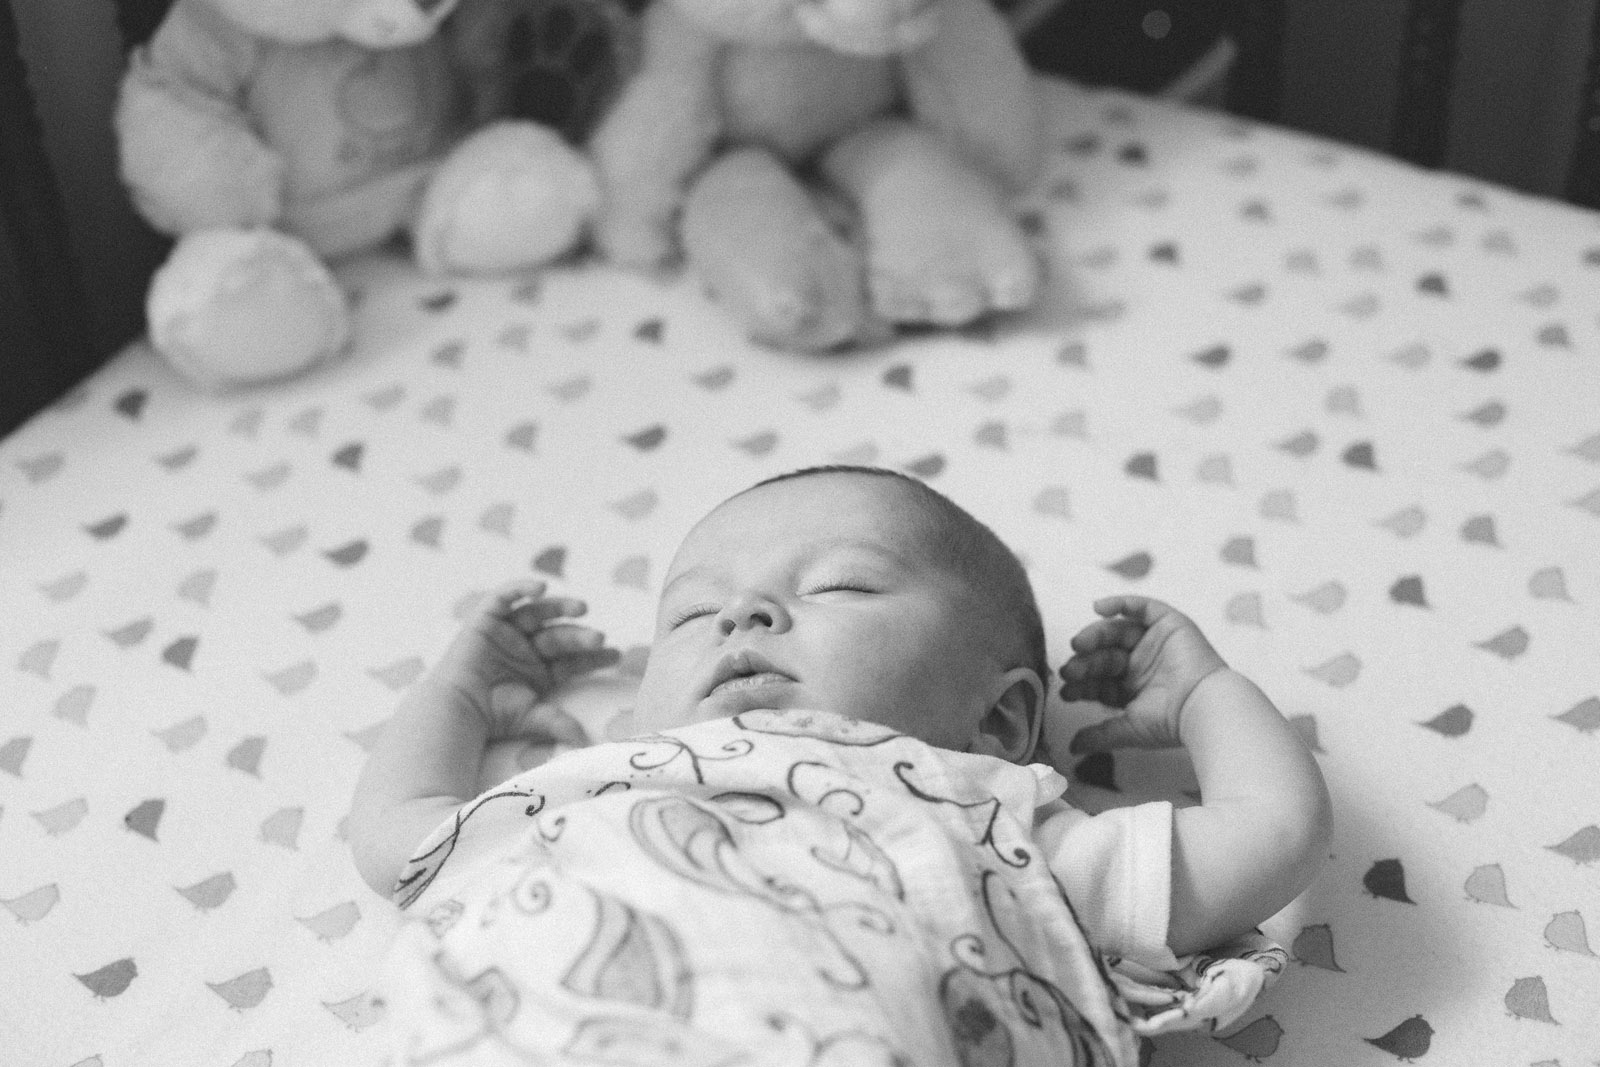 011-nursery-baby-family-birds-sleeping-woodland-new-mexico-farmington